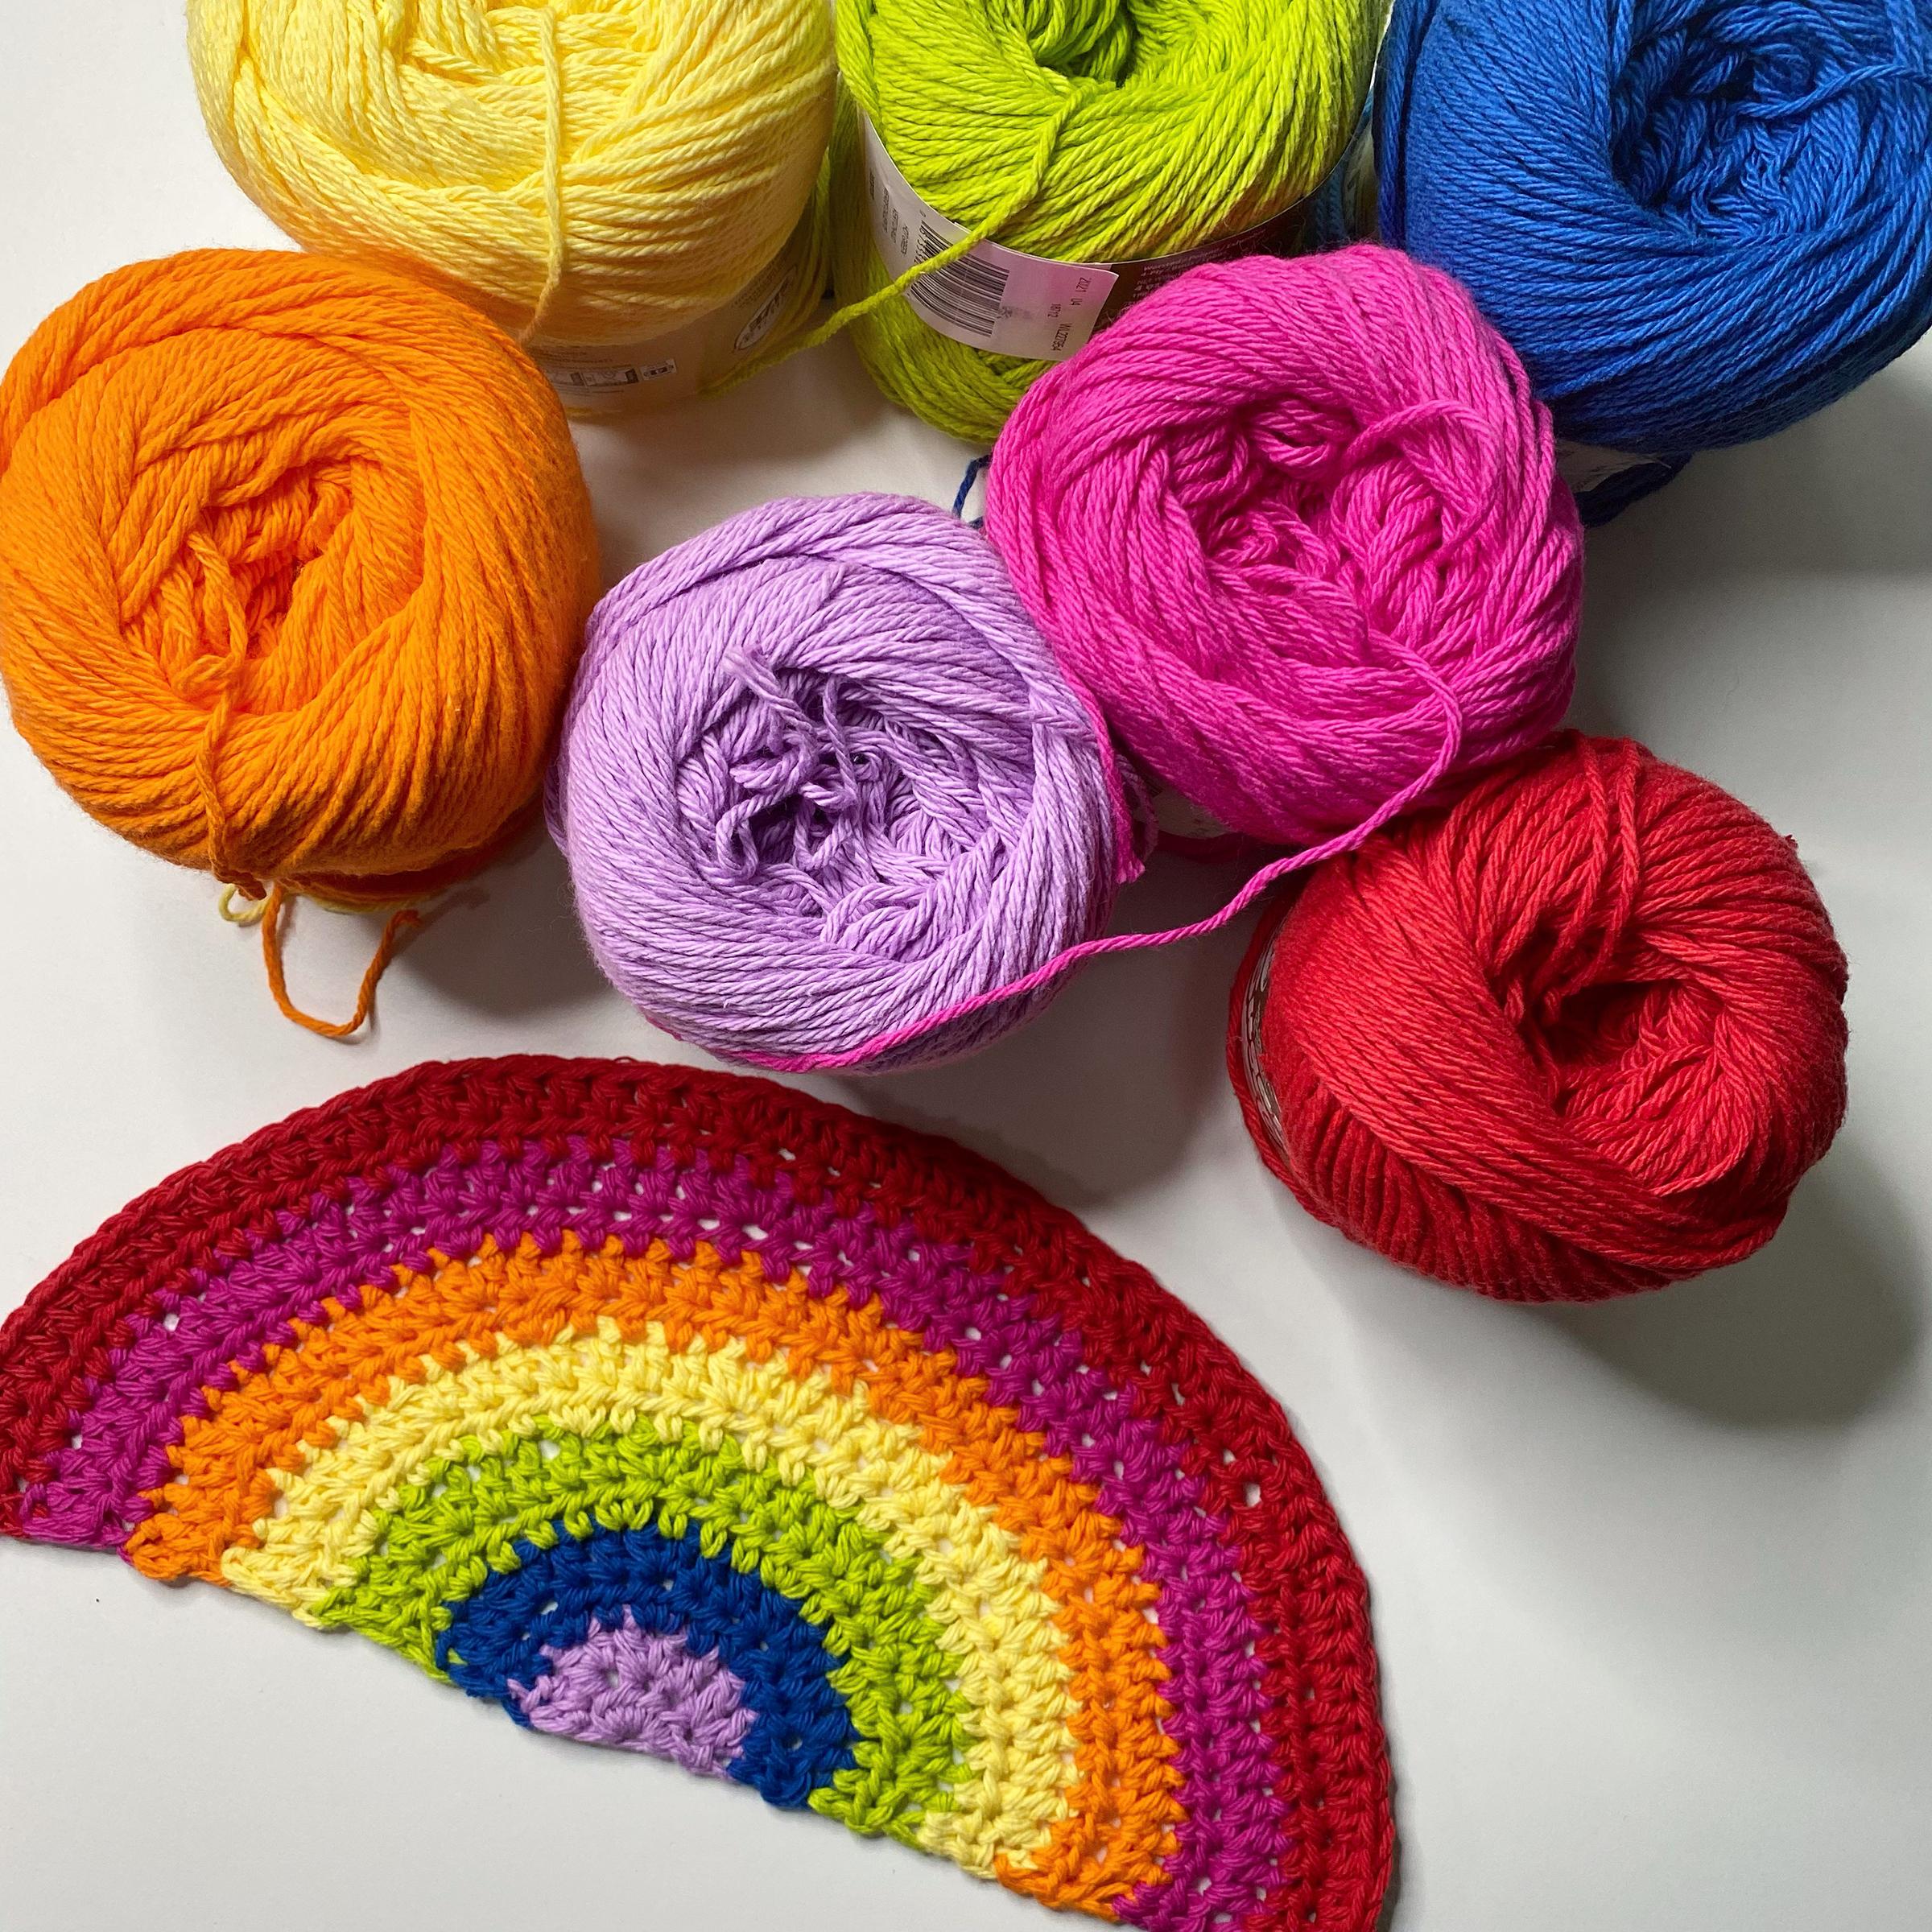 crocheted rainbow beside colorful yarn